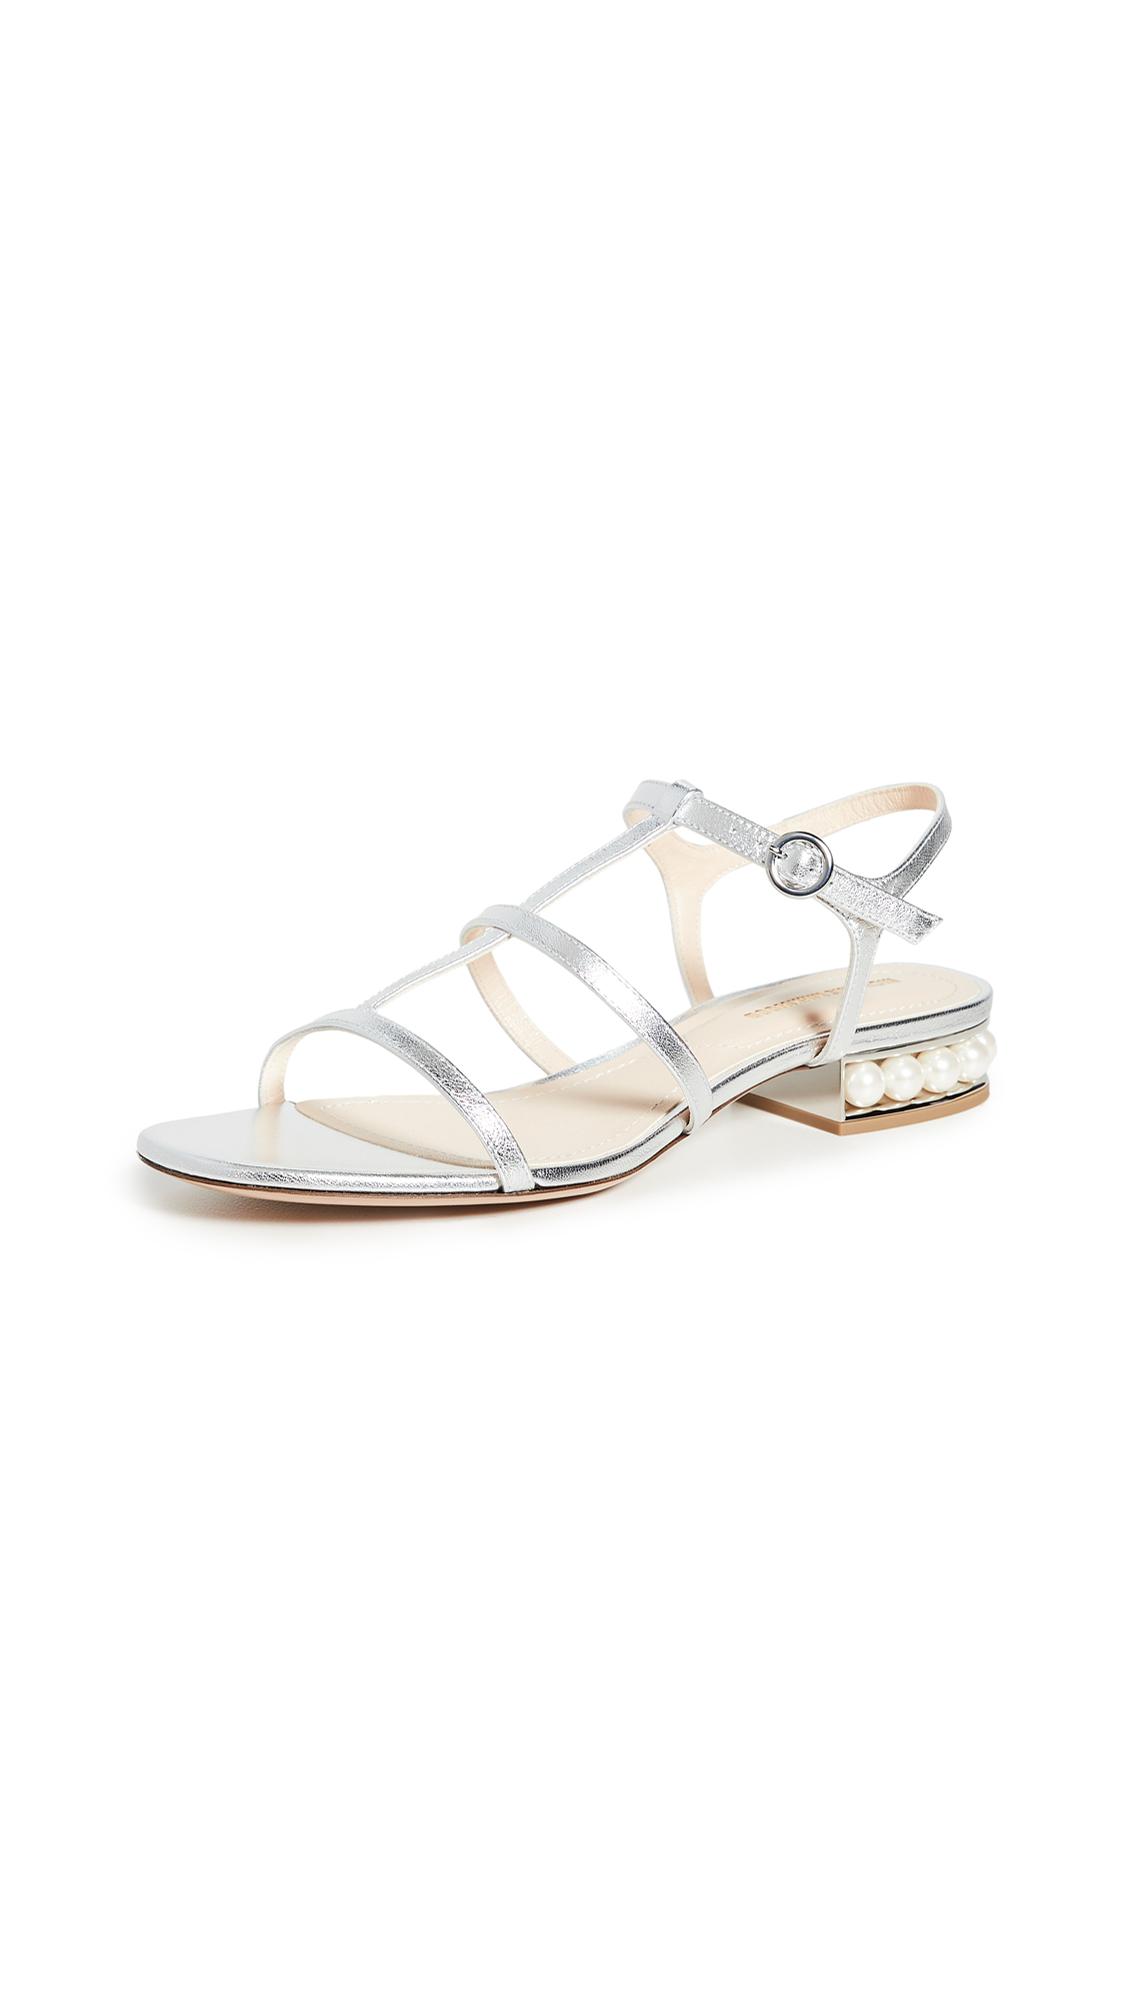 Buy Nicholas Kirkwood Casati Strap Sandals online, shop Nicholas Kirkwood